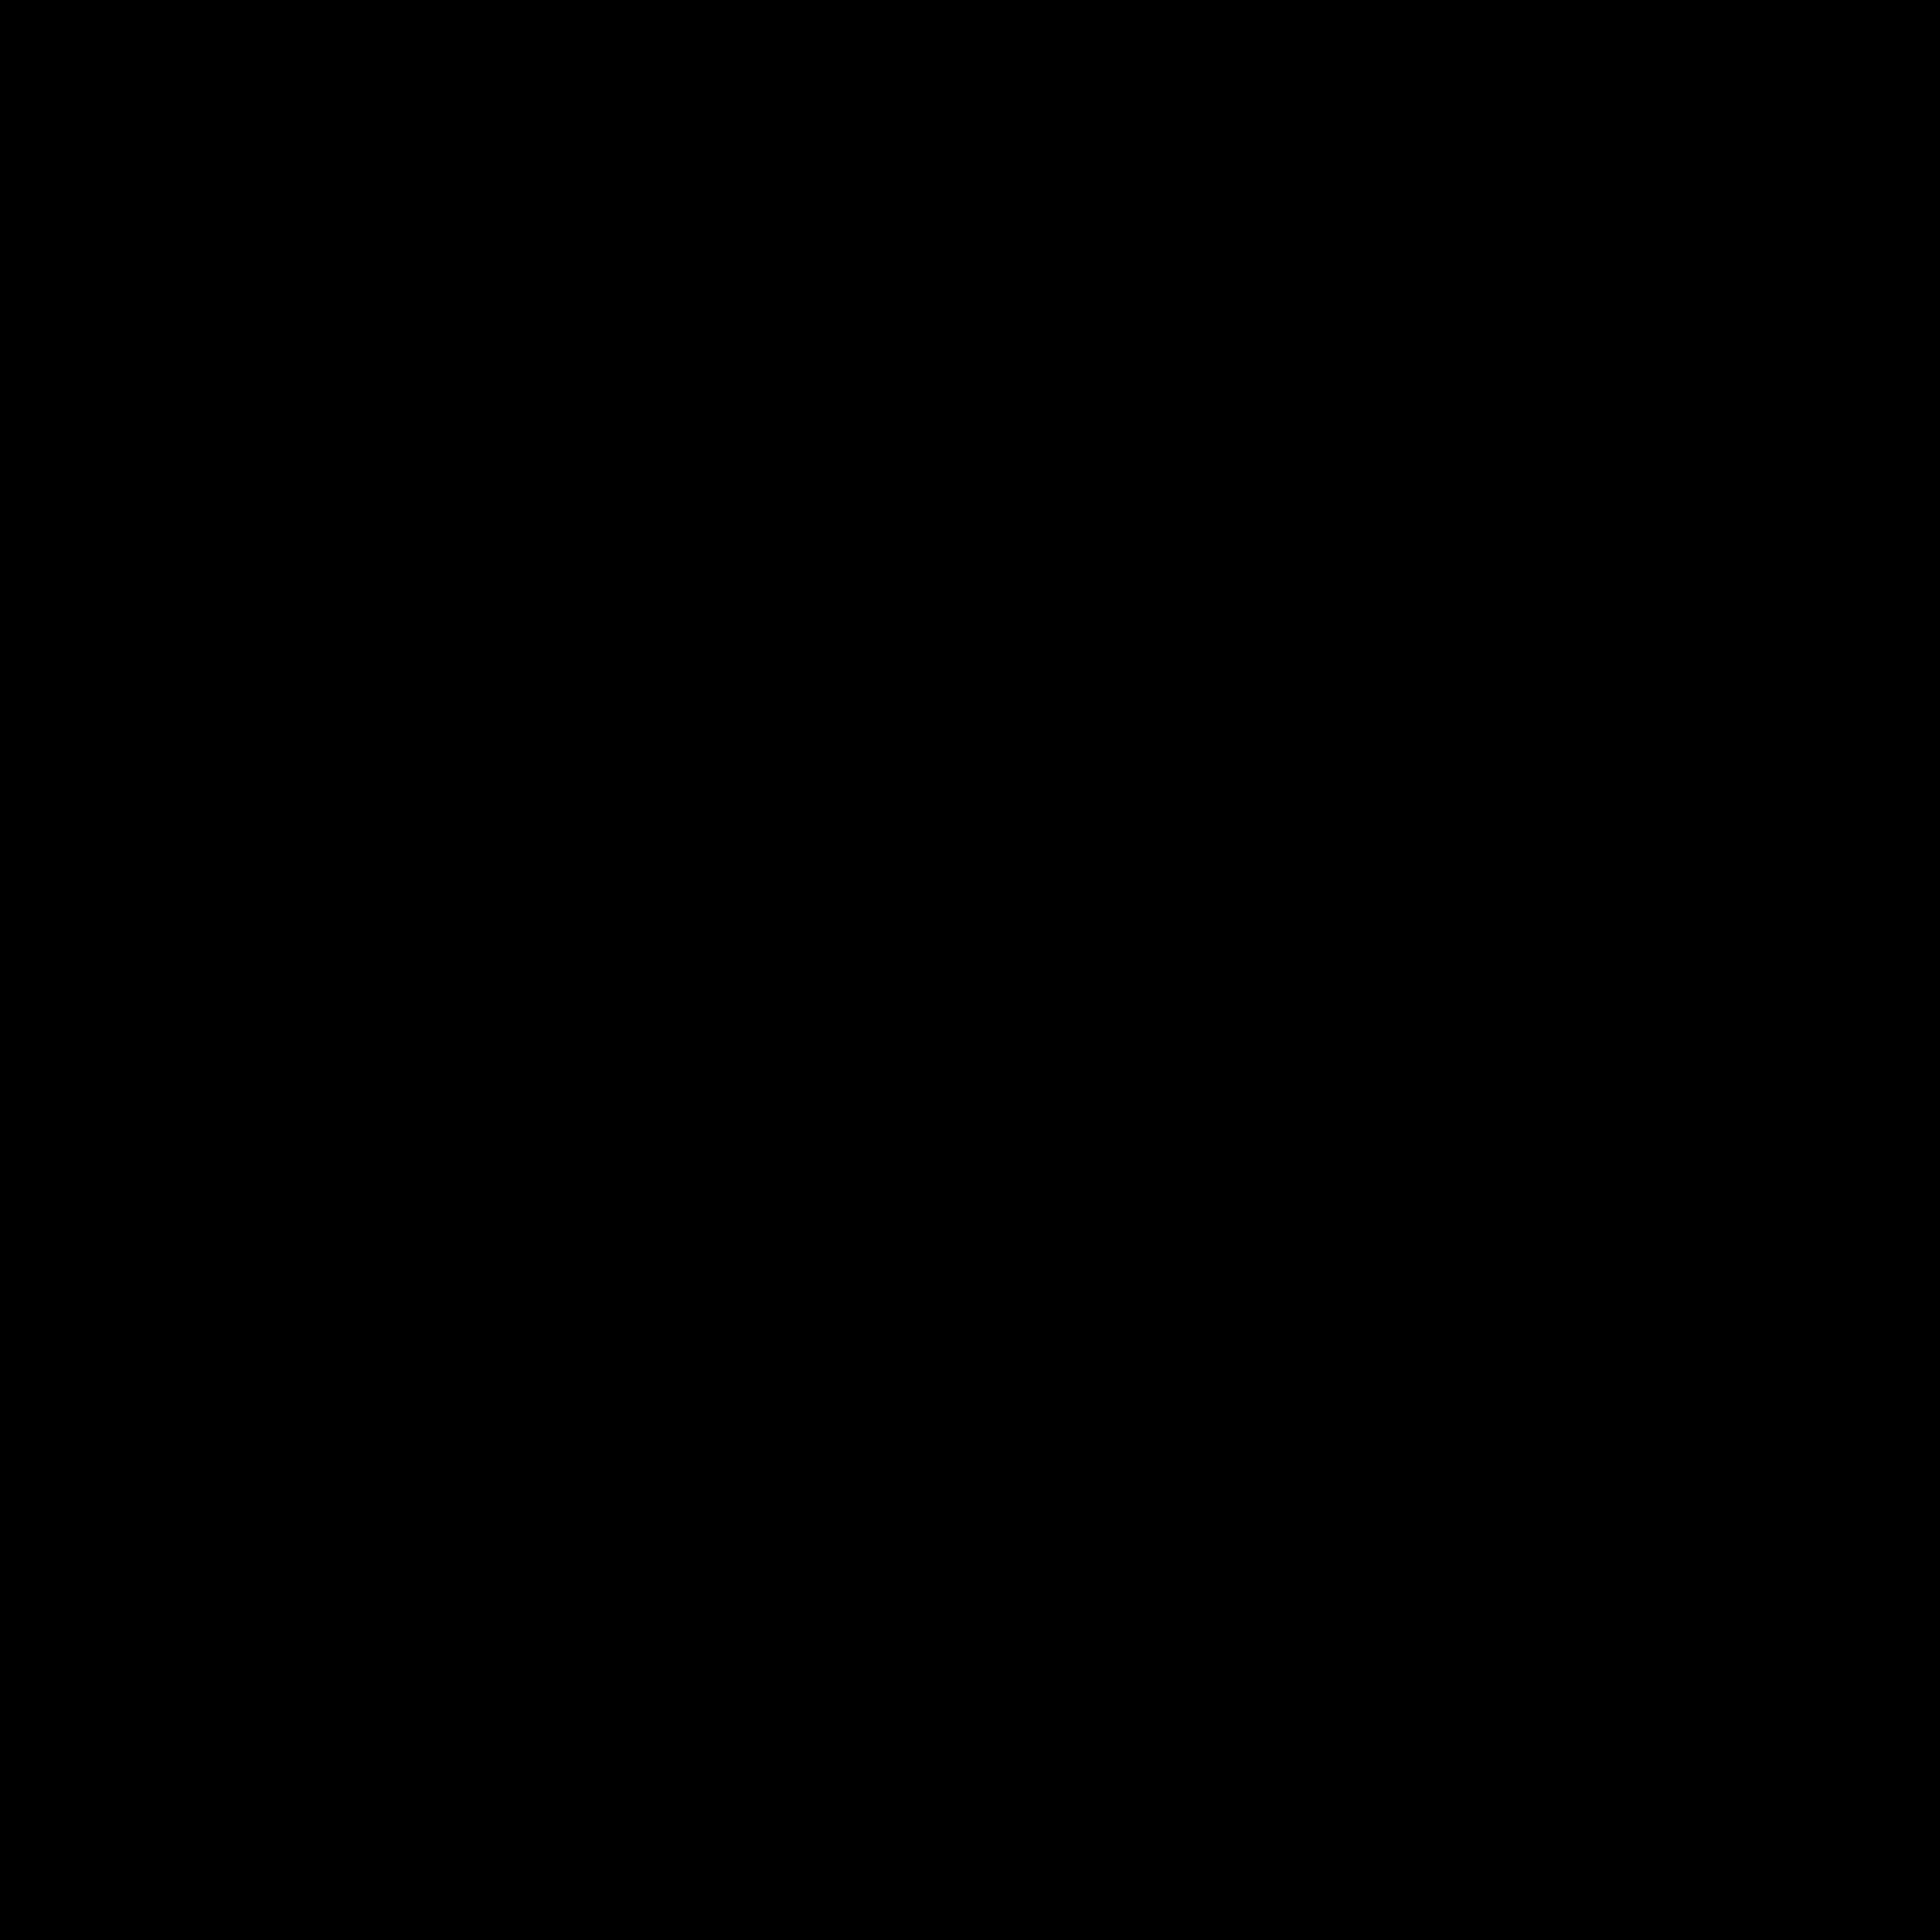 Sunset clipart powerpoint. Black bird big image